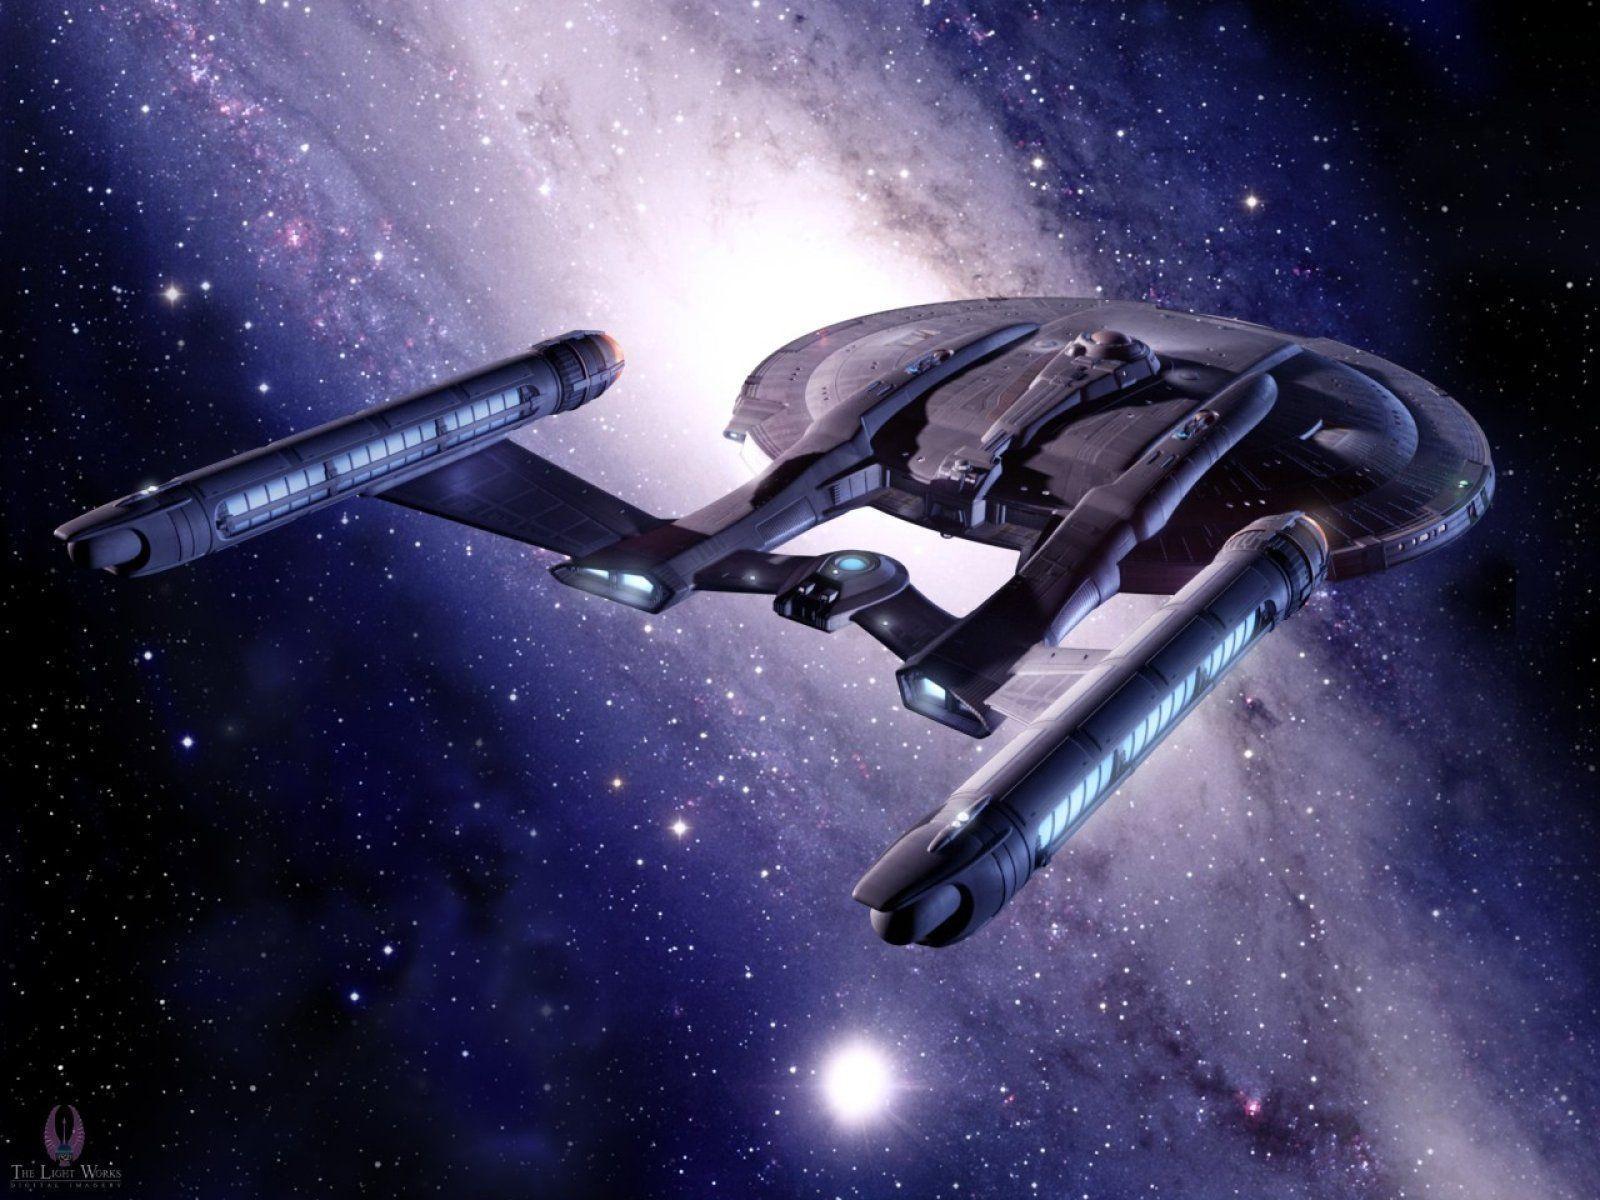 Klingon Ship Into Darkness Star Trek Enterprise W...